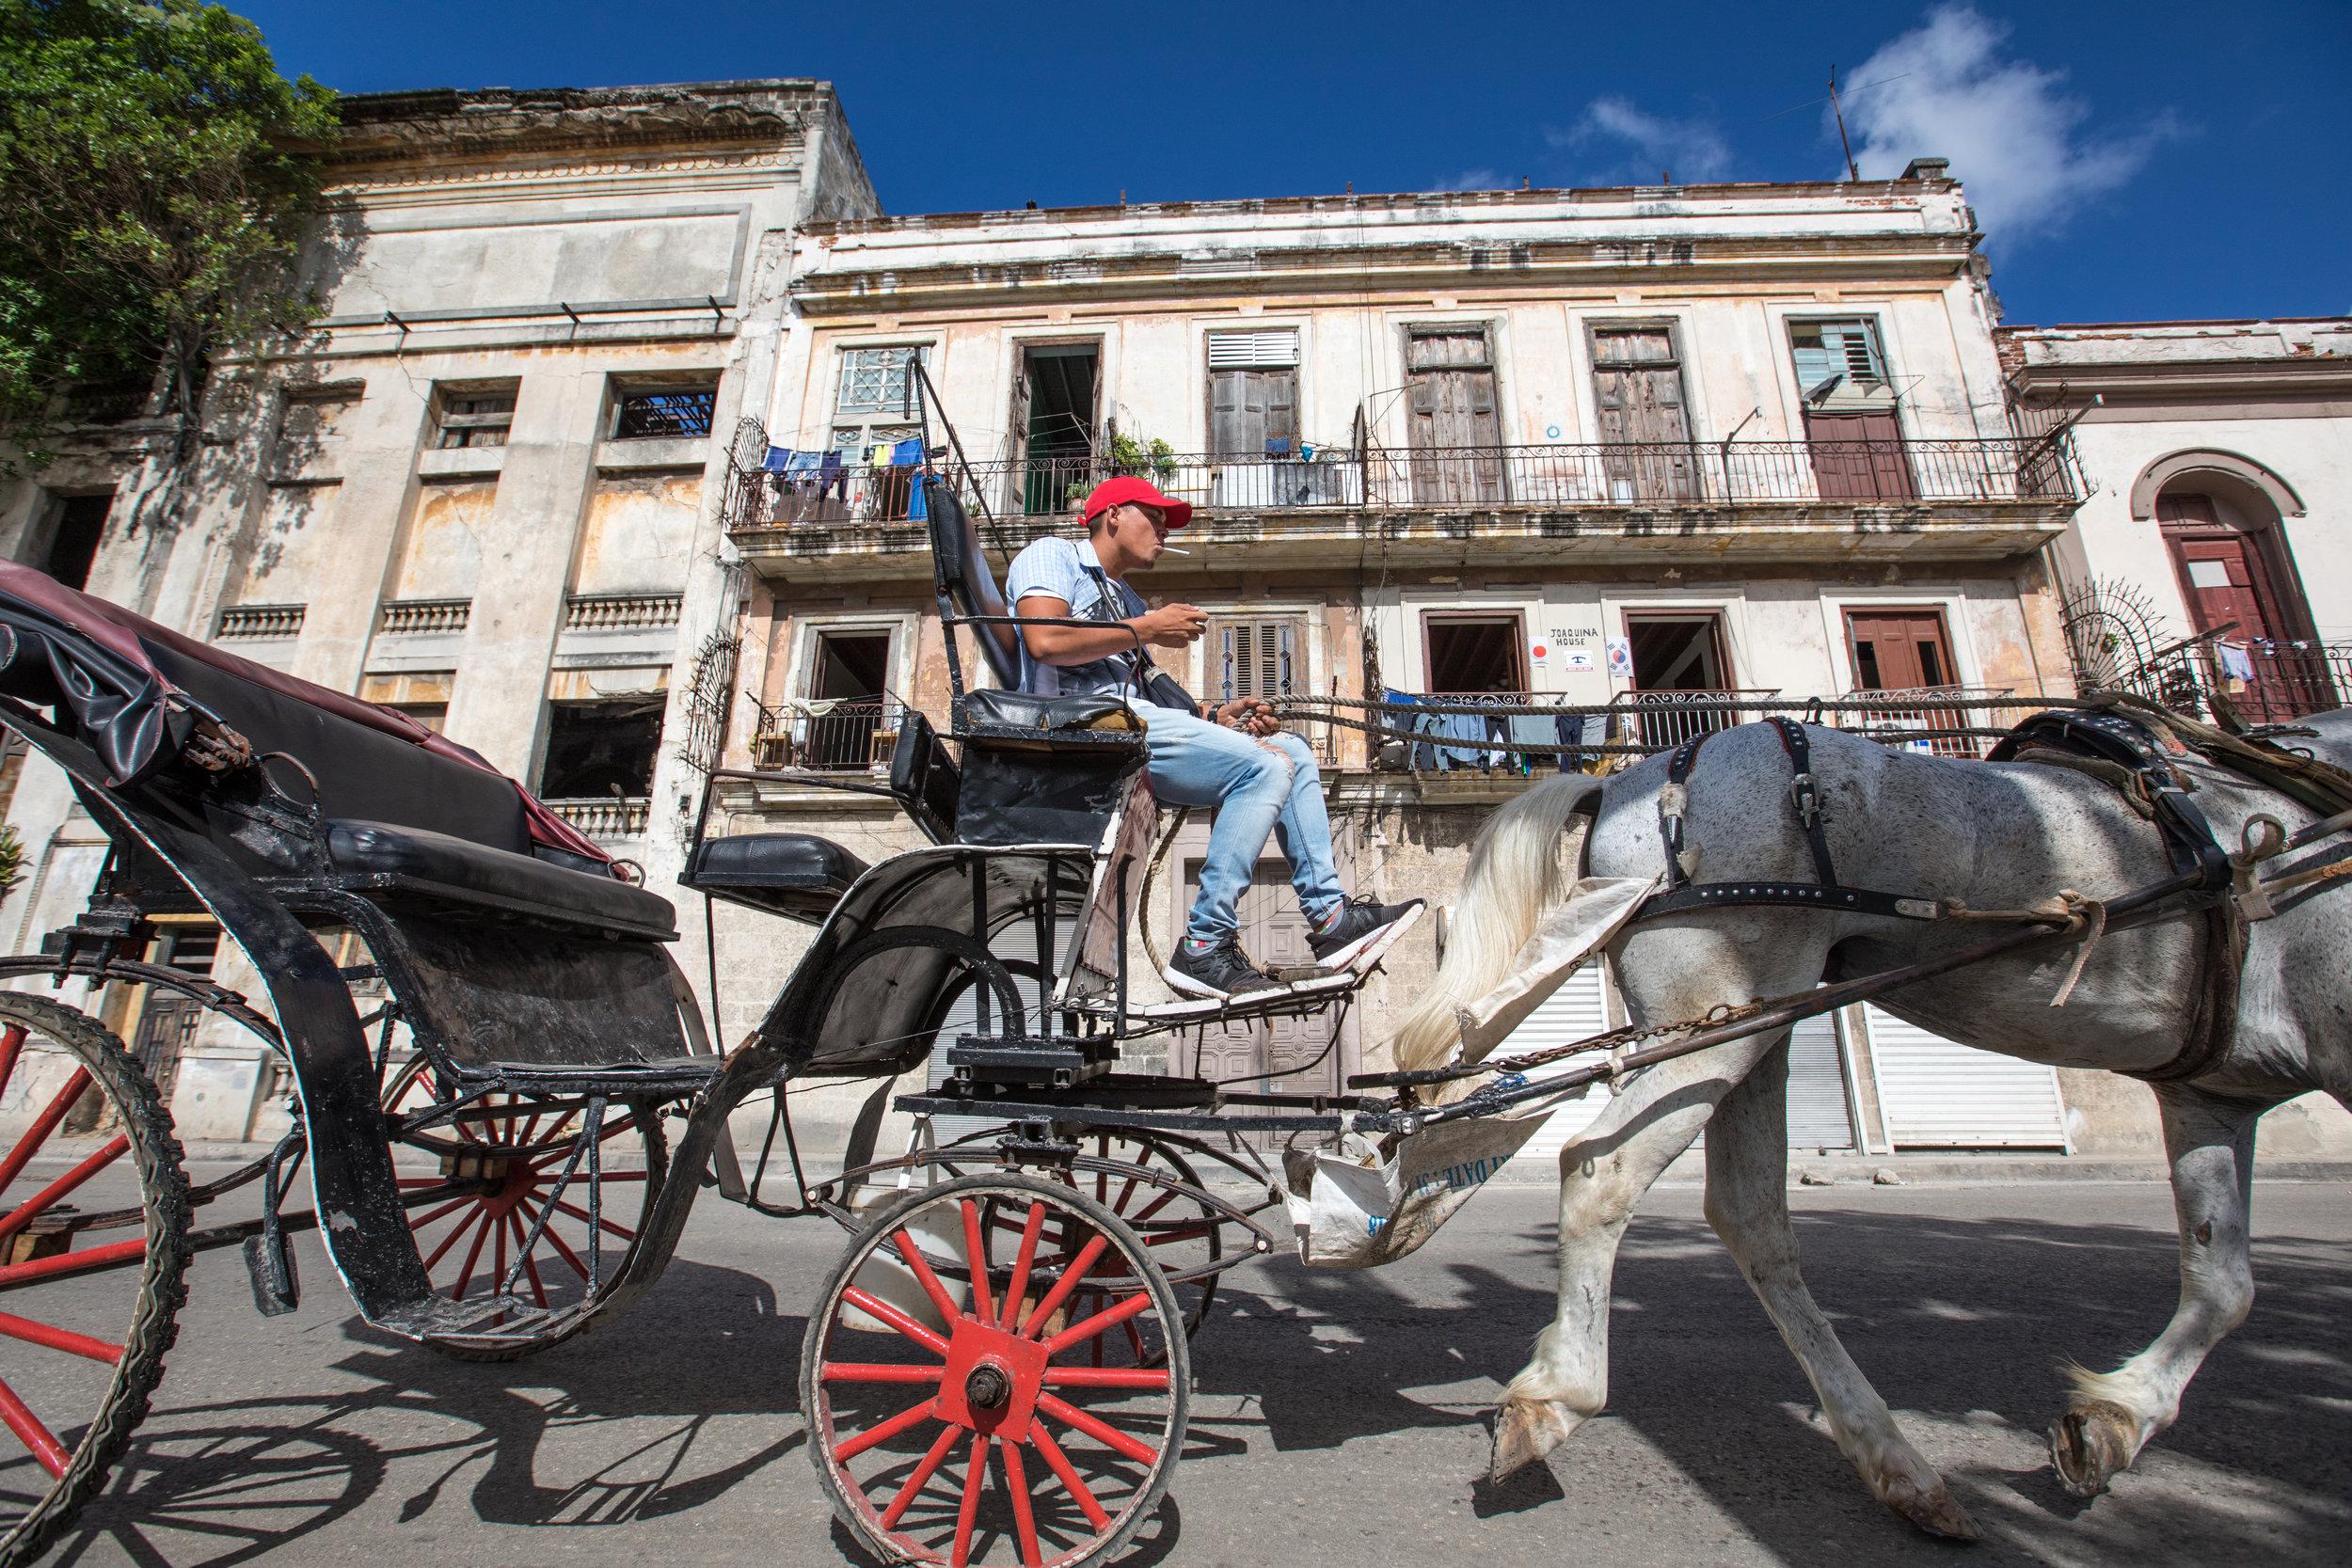 5.  Horse & Cart on the streets of La Habana, Cuba.